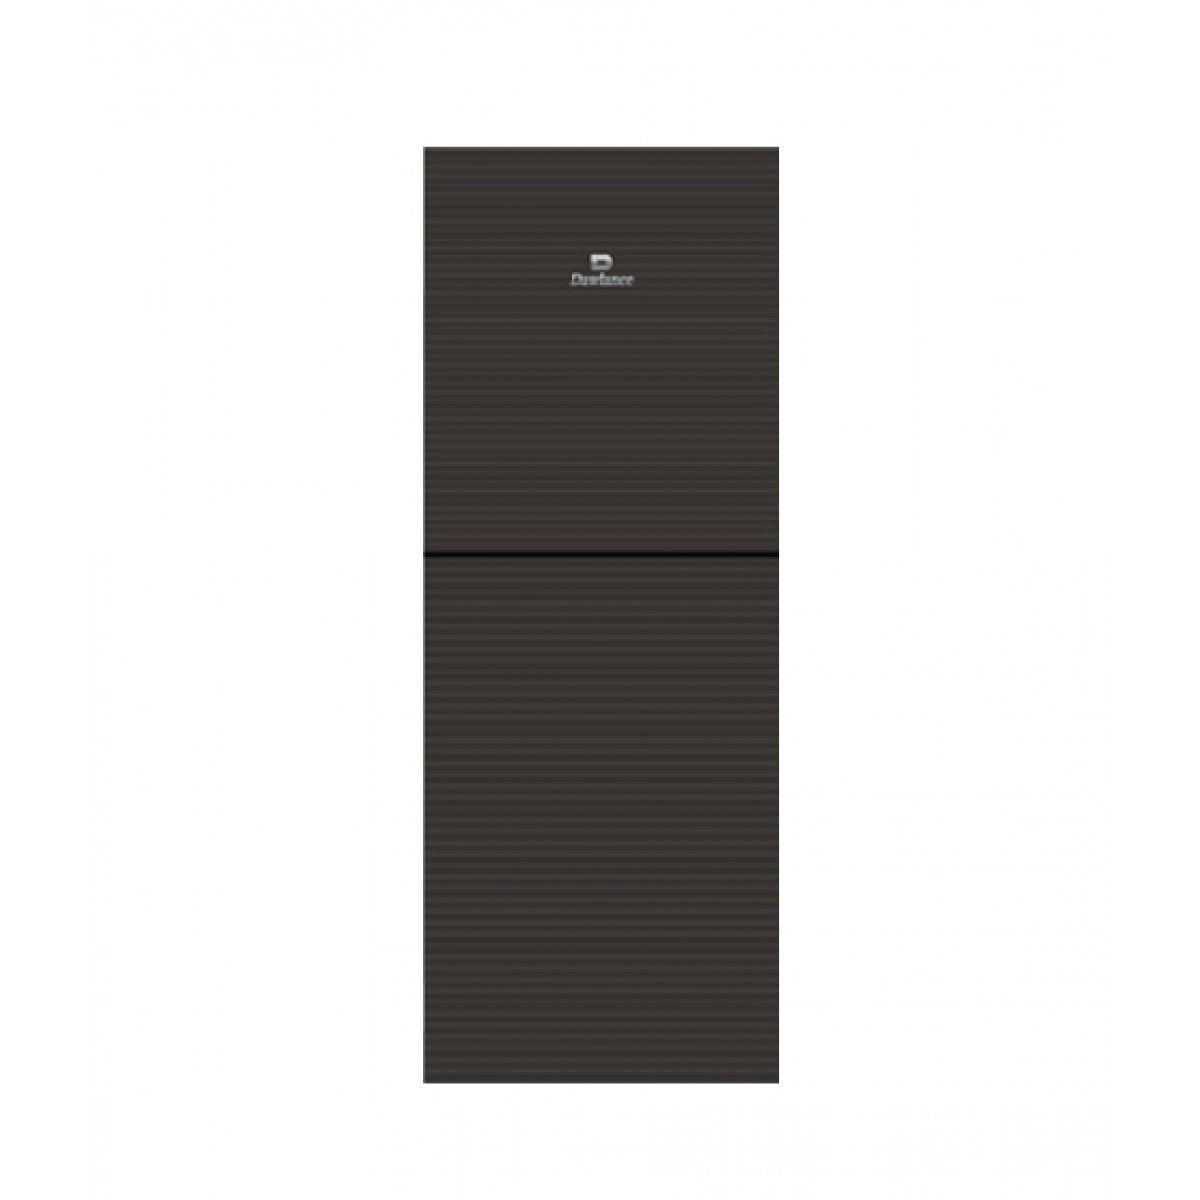 Dawlance Refrigerator 9 Cu ft Black (9150LF)